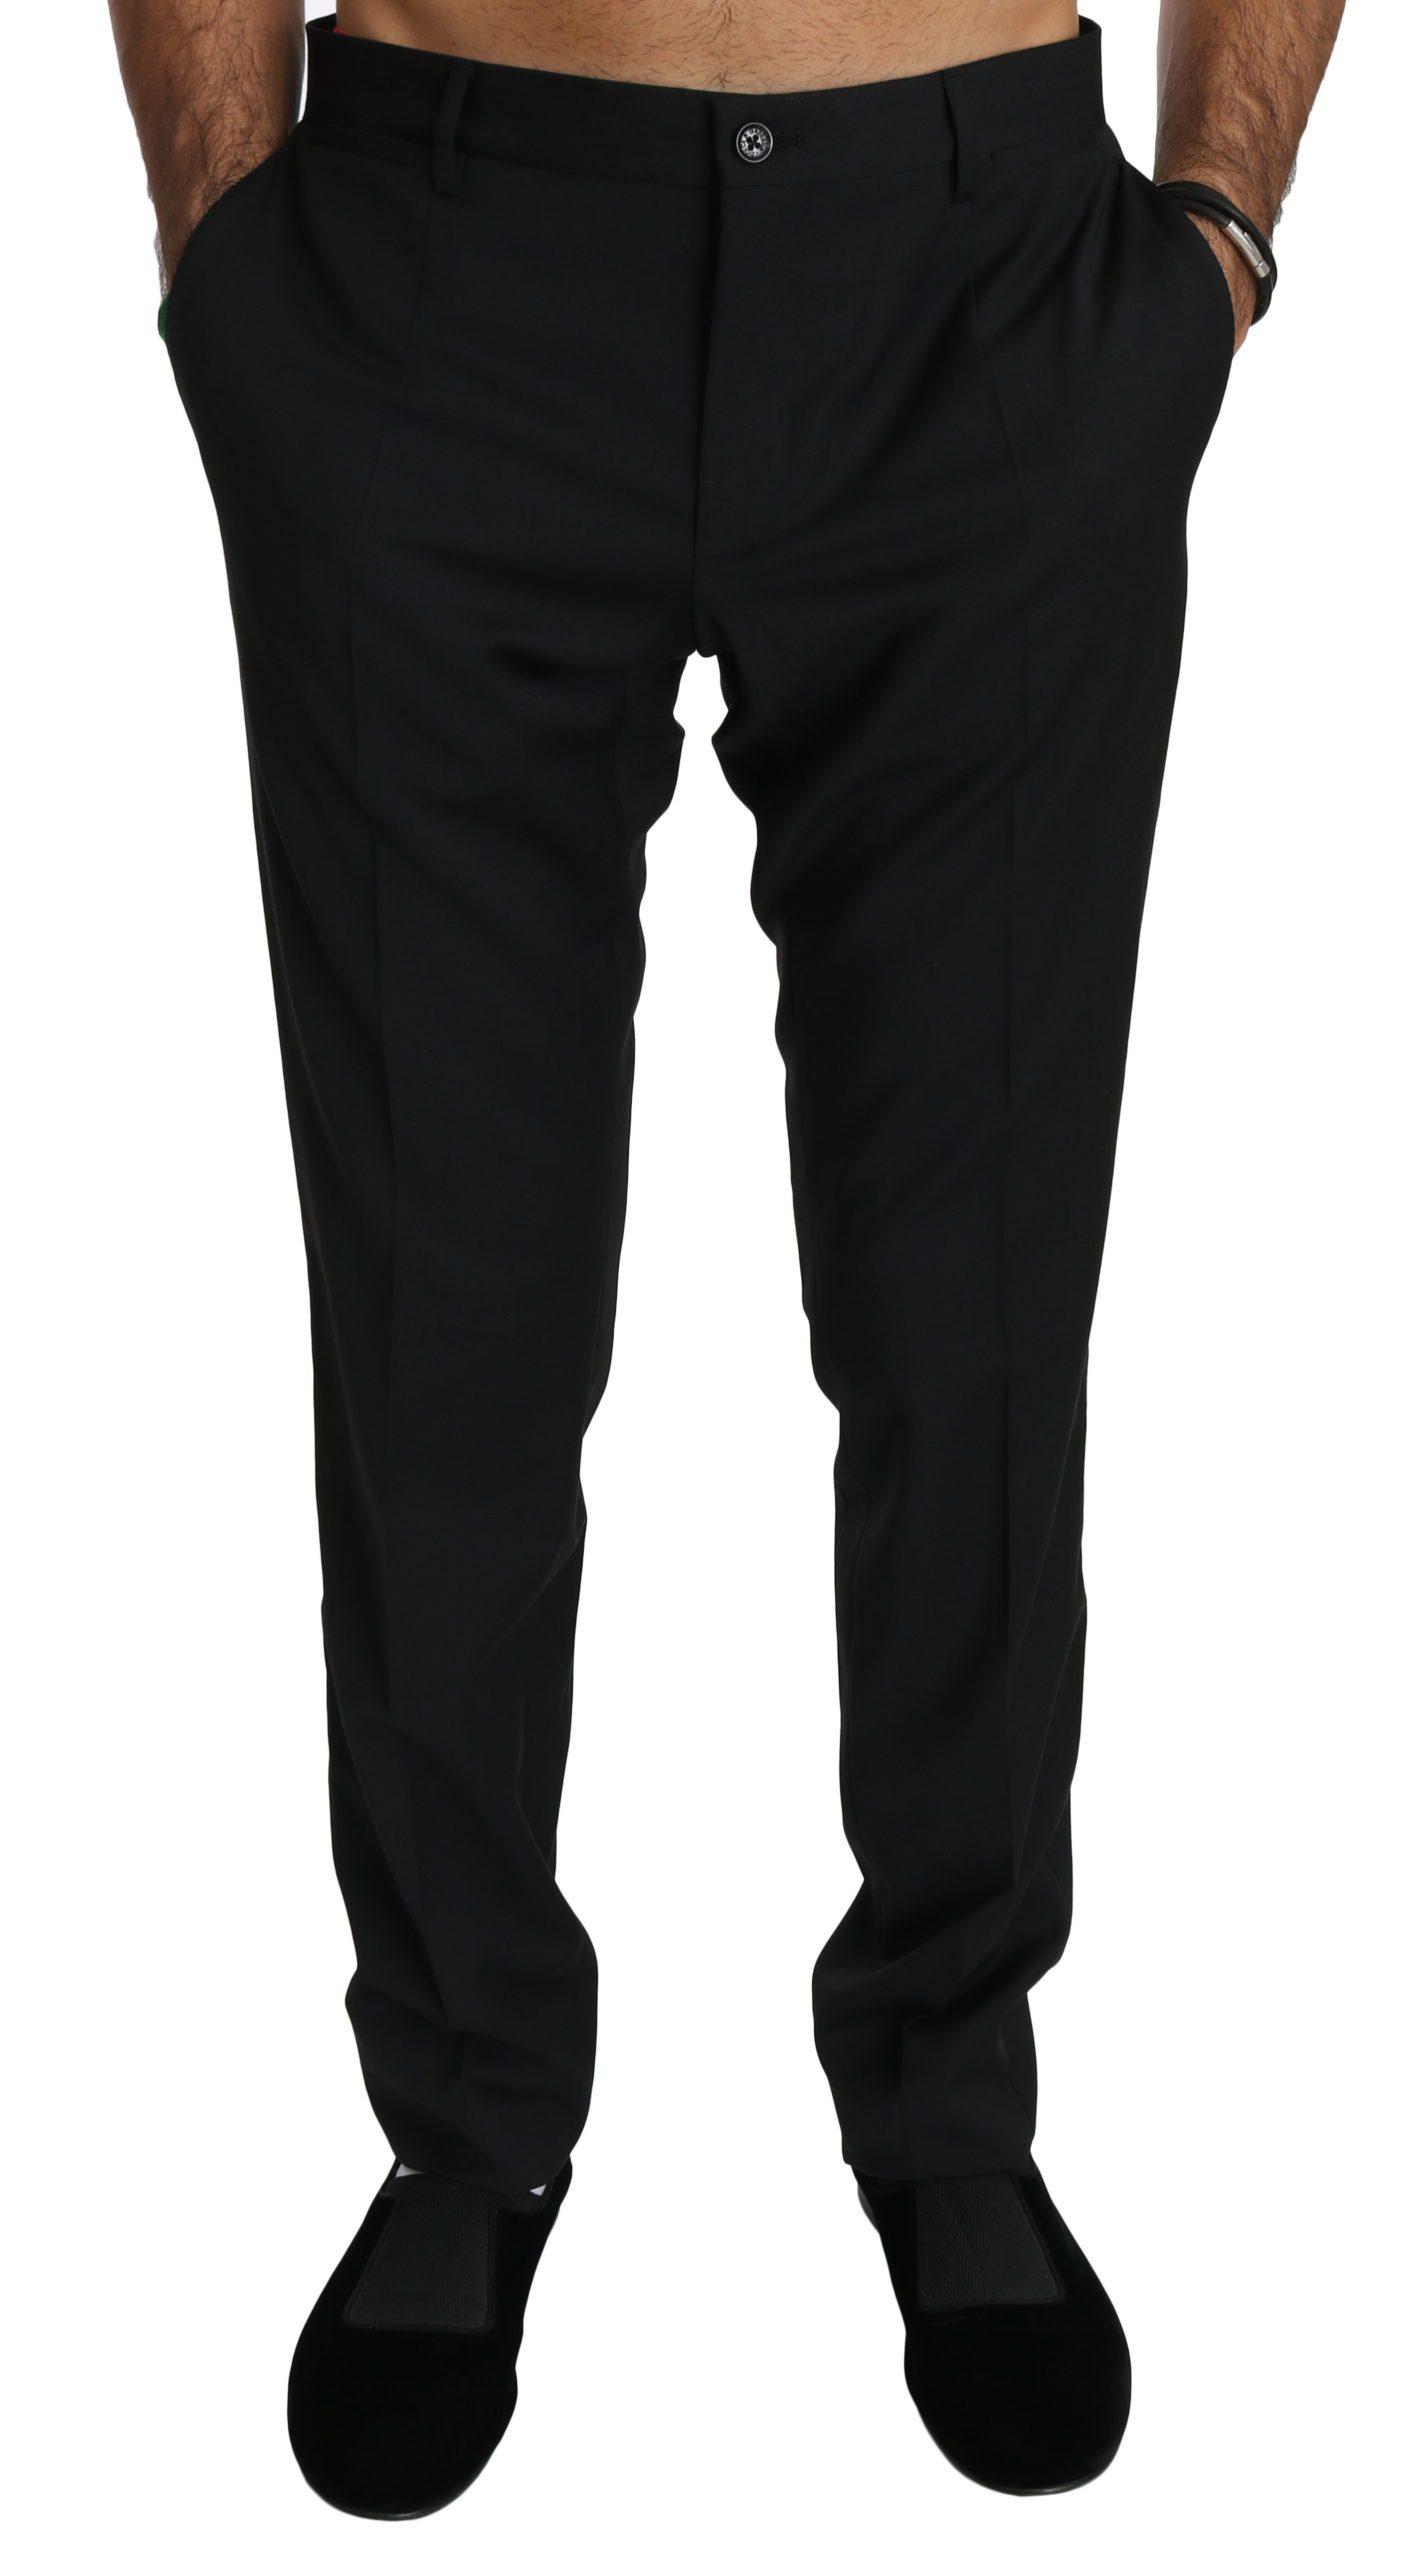 Dolce & Gabbana Men's Skinny Dress Wool Trouser Black PAN70760 - IT48 | M